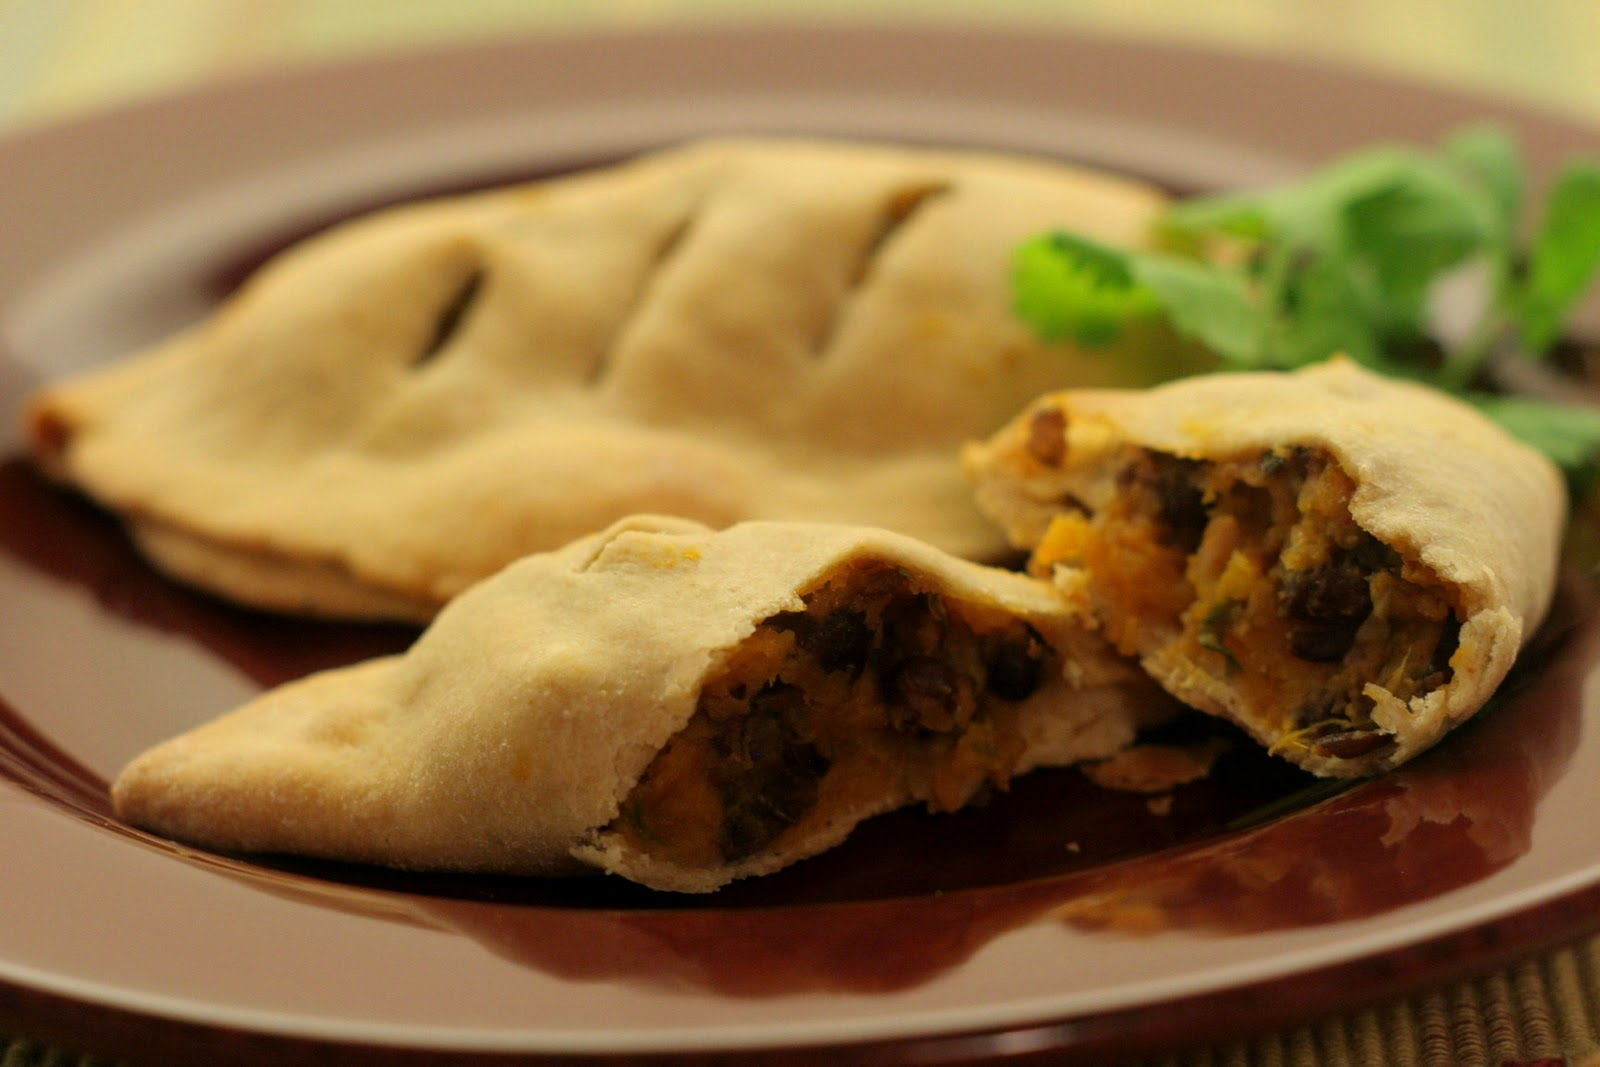 Four seasons of food: Sweet potato and black bean empanadas